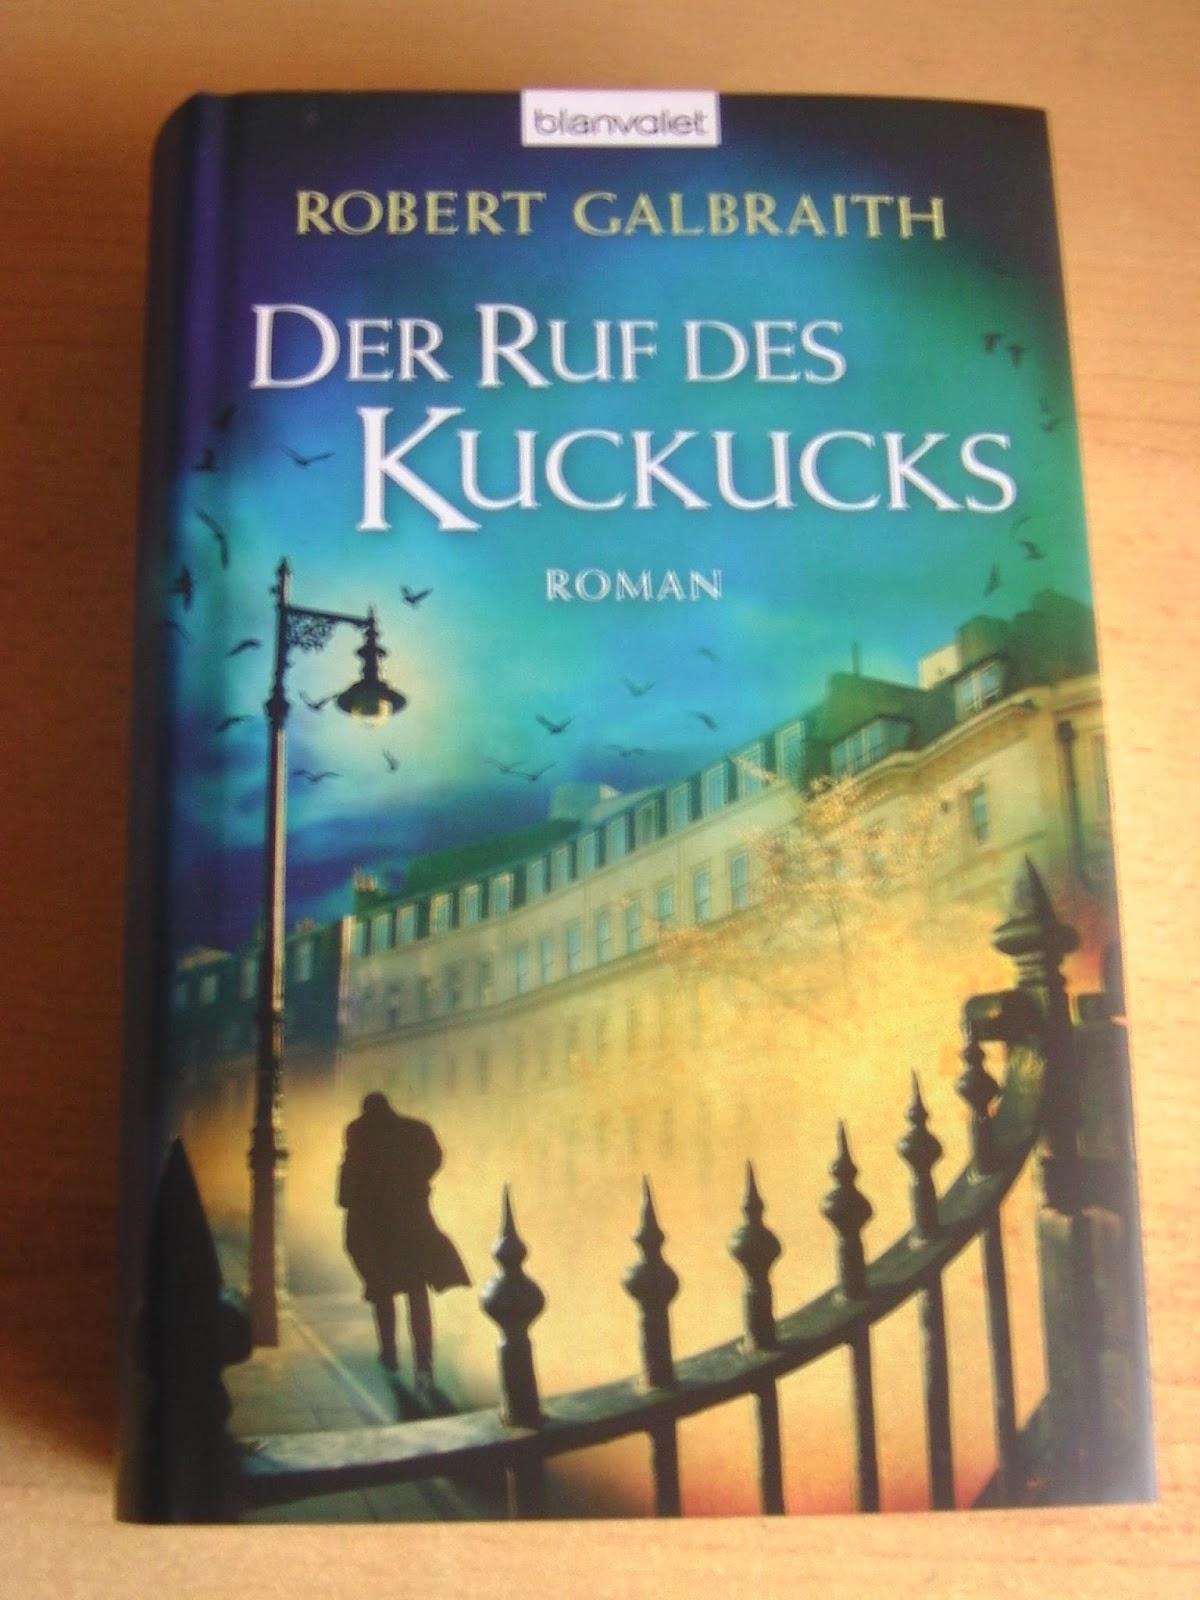 http://steffis-und-heikes-lesezauber.blogspot.de/2014/01/rezension-der-ruf-des-kuckucks-robert.html